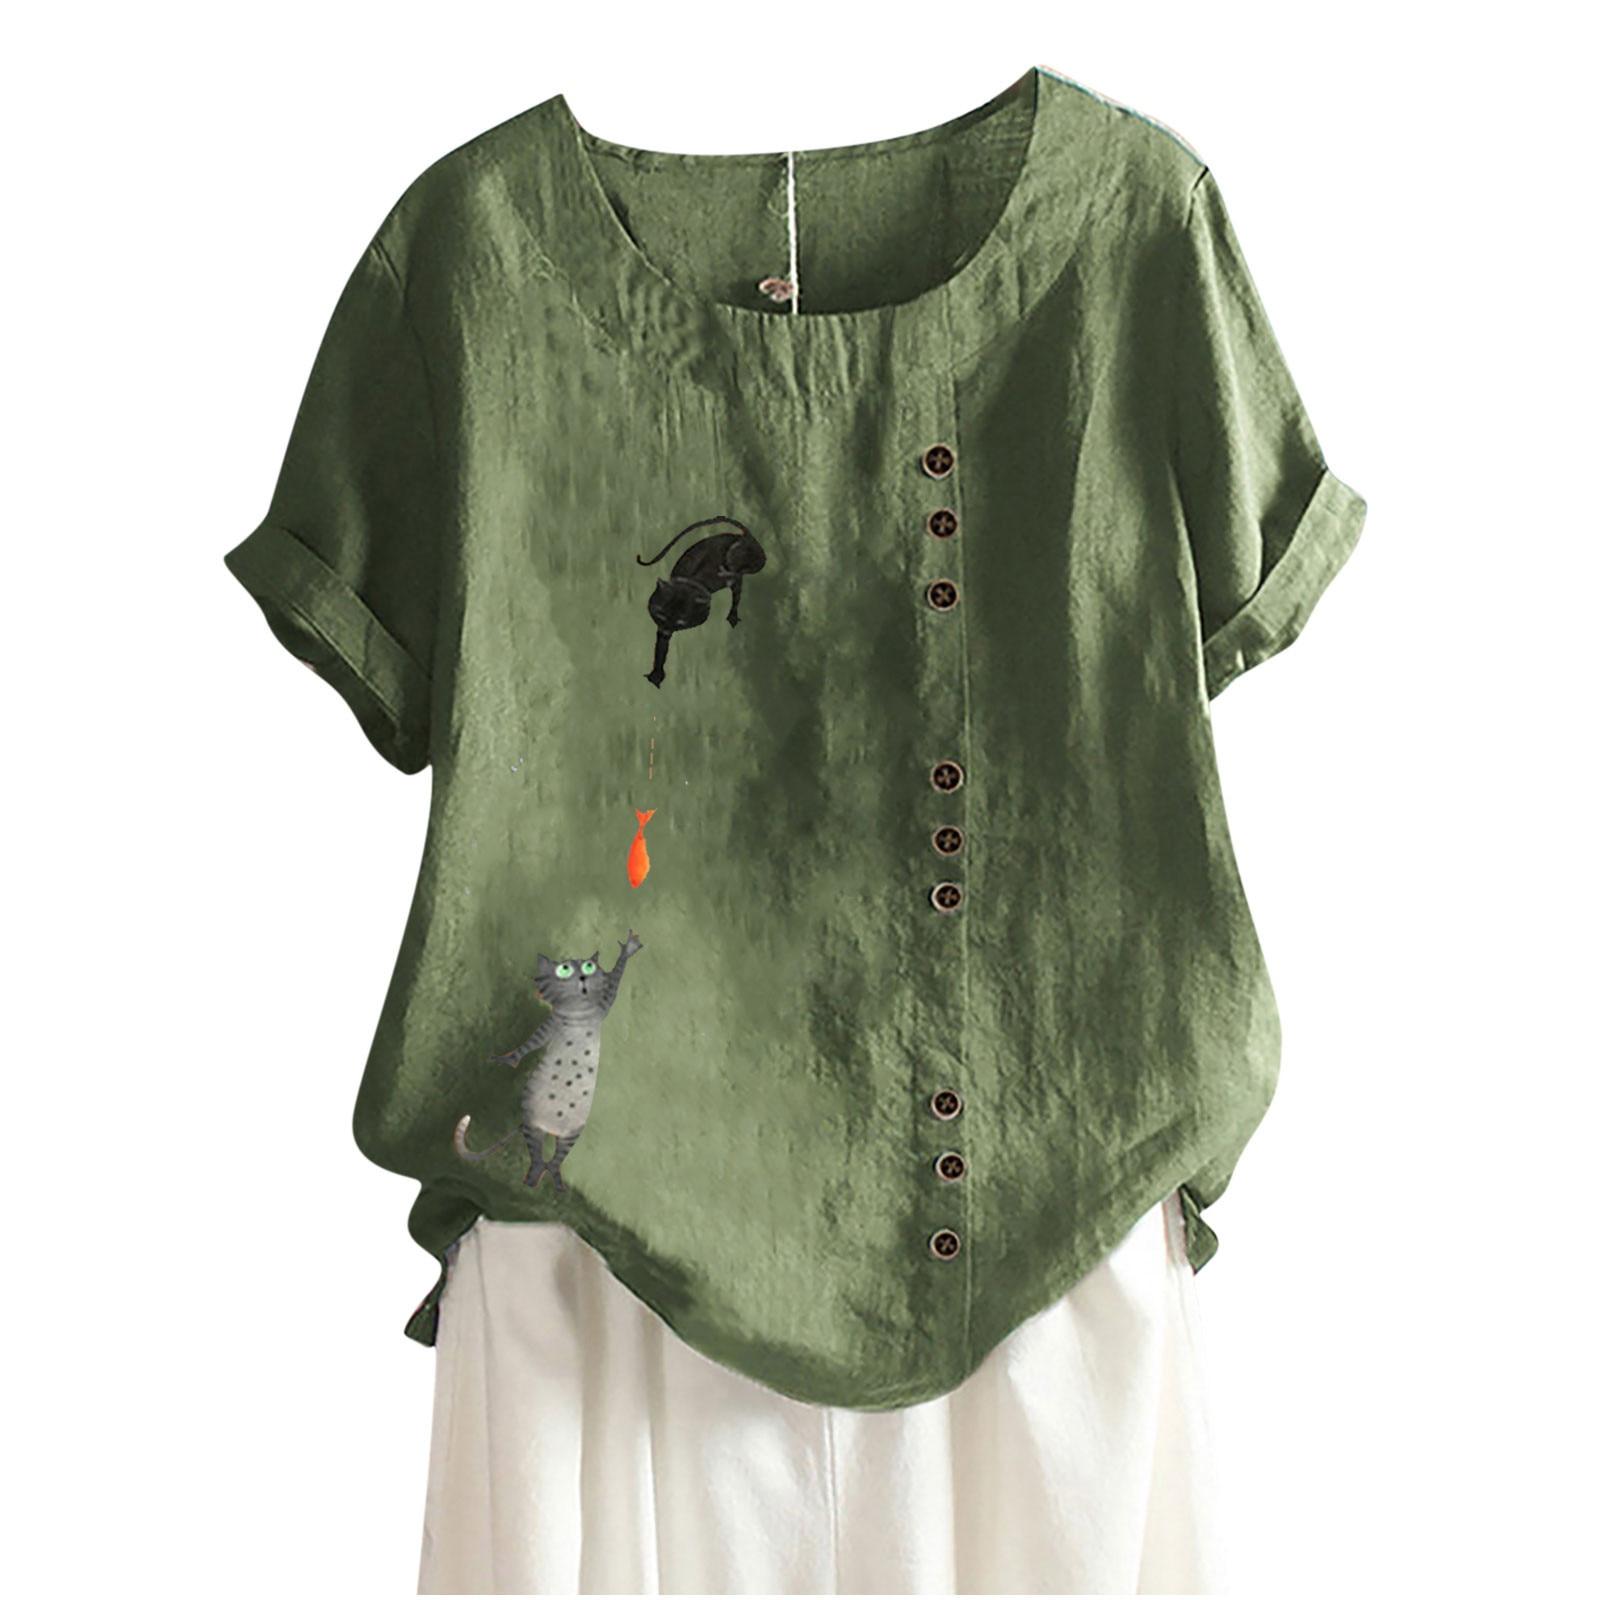 Sagace T Shirt Women Harajuku Fashion Cat Print T-shirt O-neck Short Sleeve Blouse Top Tee Vetement Femme 2021 Футболка Женский